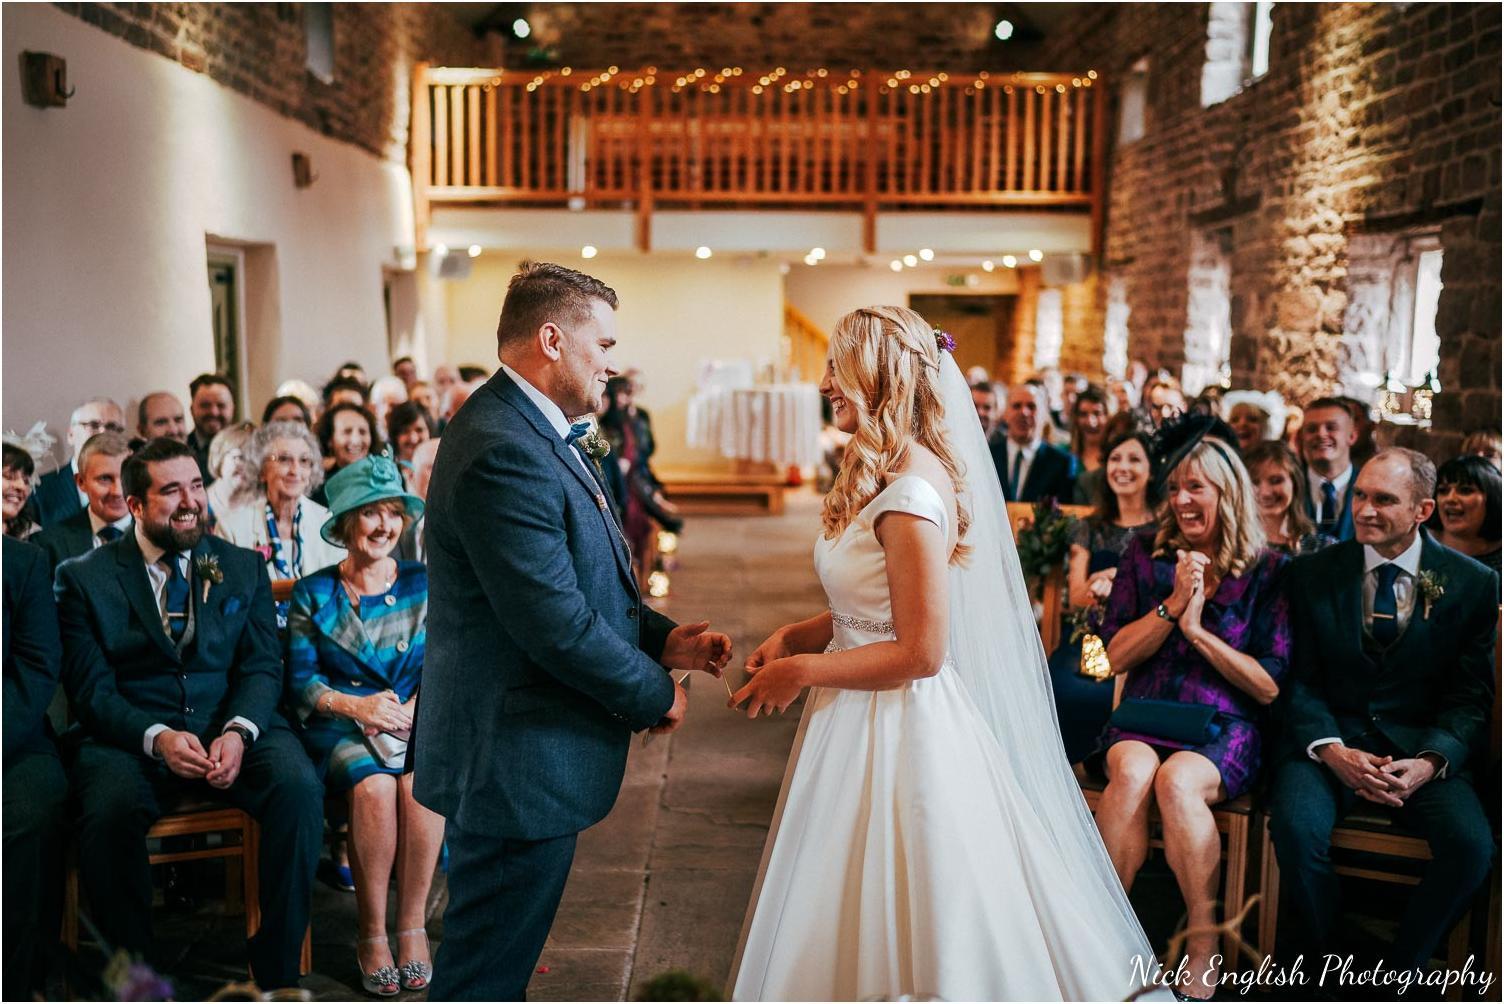 The_Ashes_Barn_Endon_Stoke_Wedding_Photographer-42.jpg